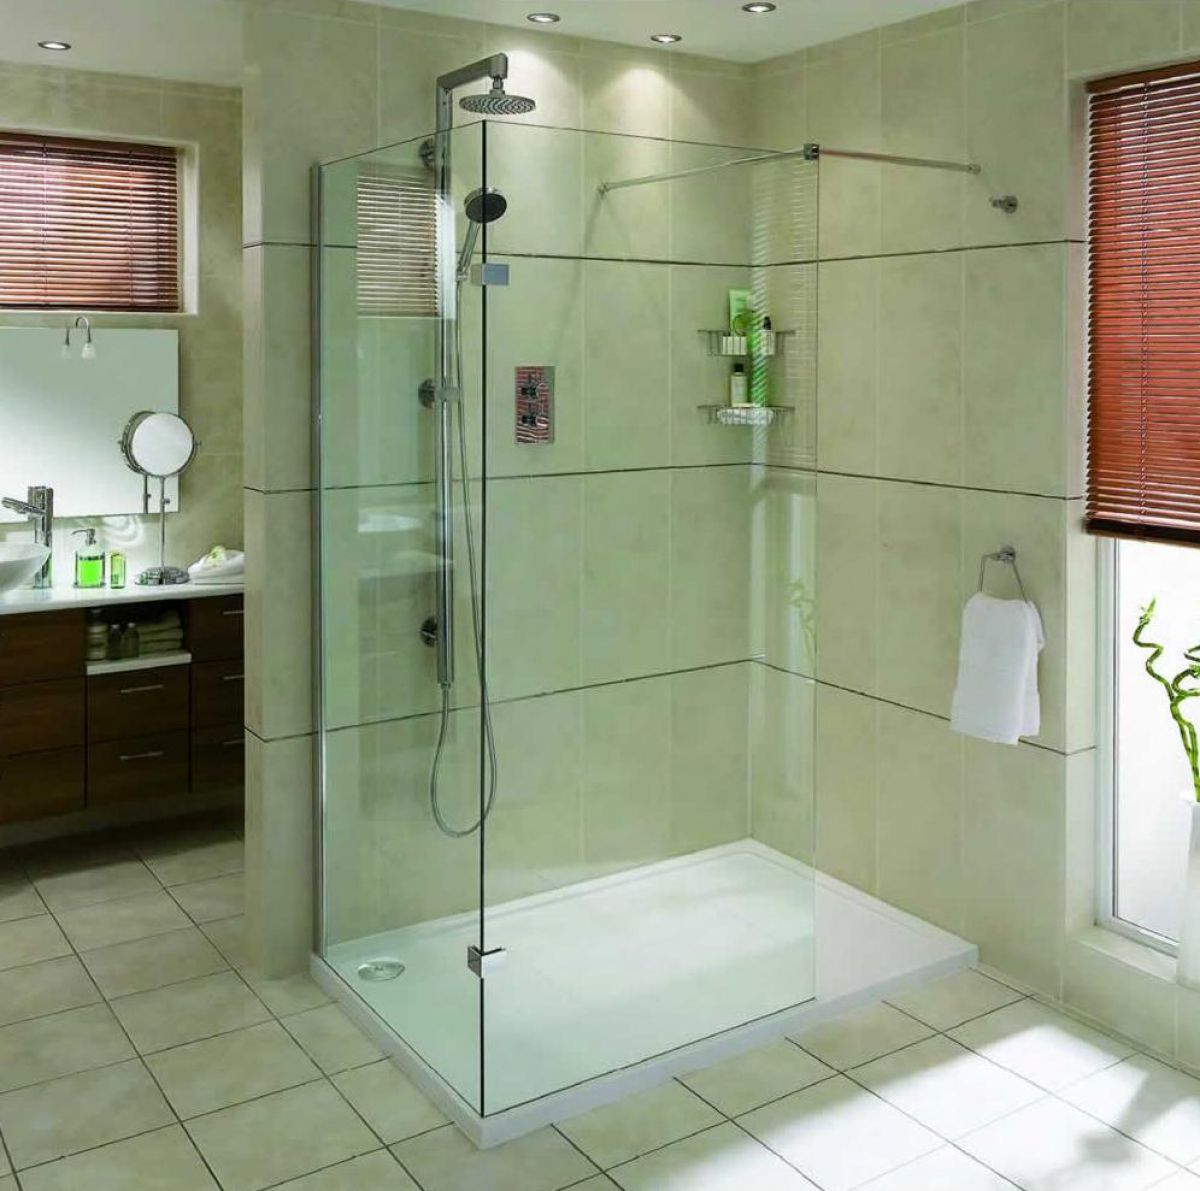 Aqata spectra walk in shower enclosure sp410 corner uk for Walk in shower plans and specs